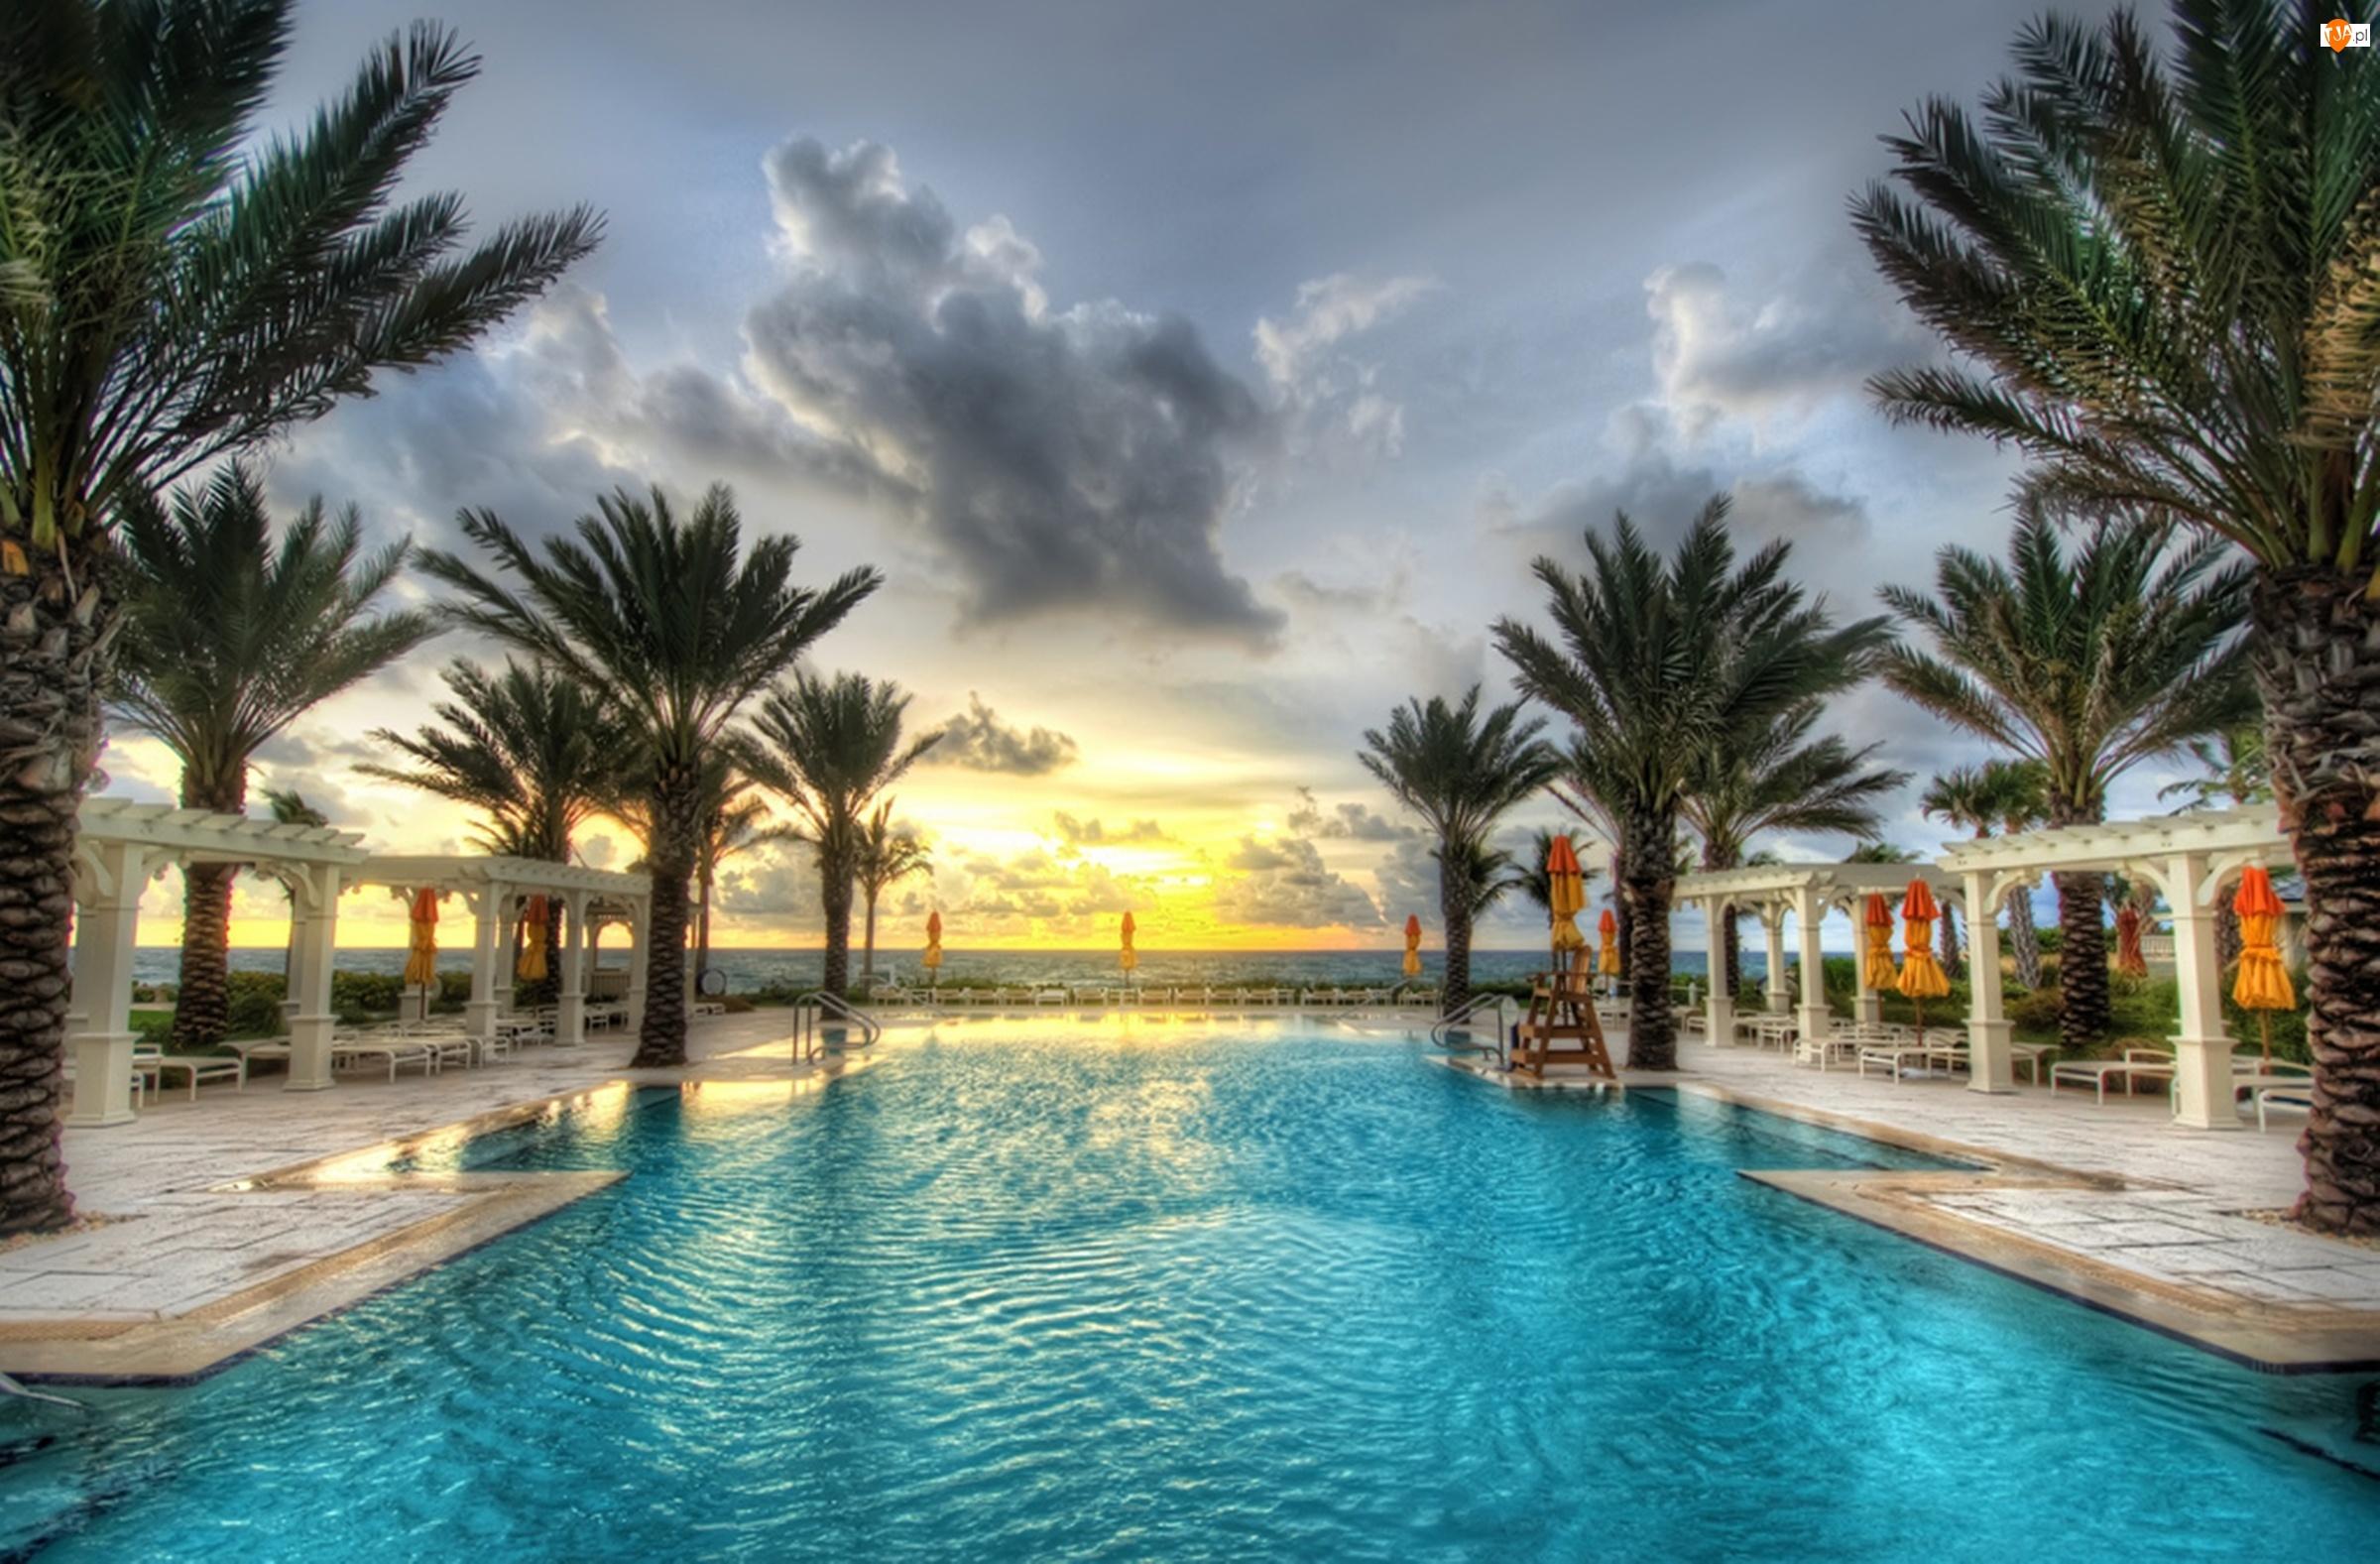 USA, Basen, Palm Beach, Palmy, Floryda